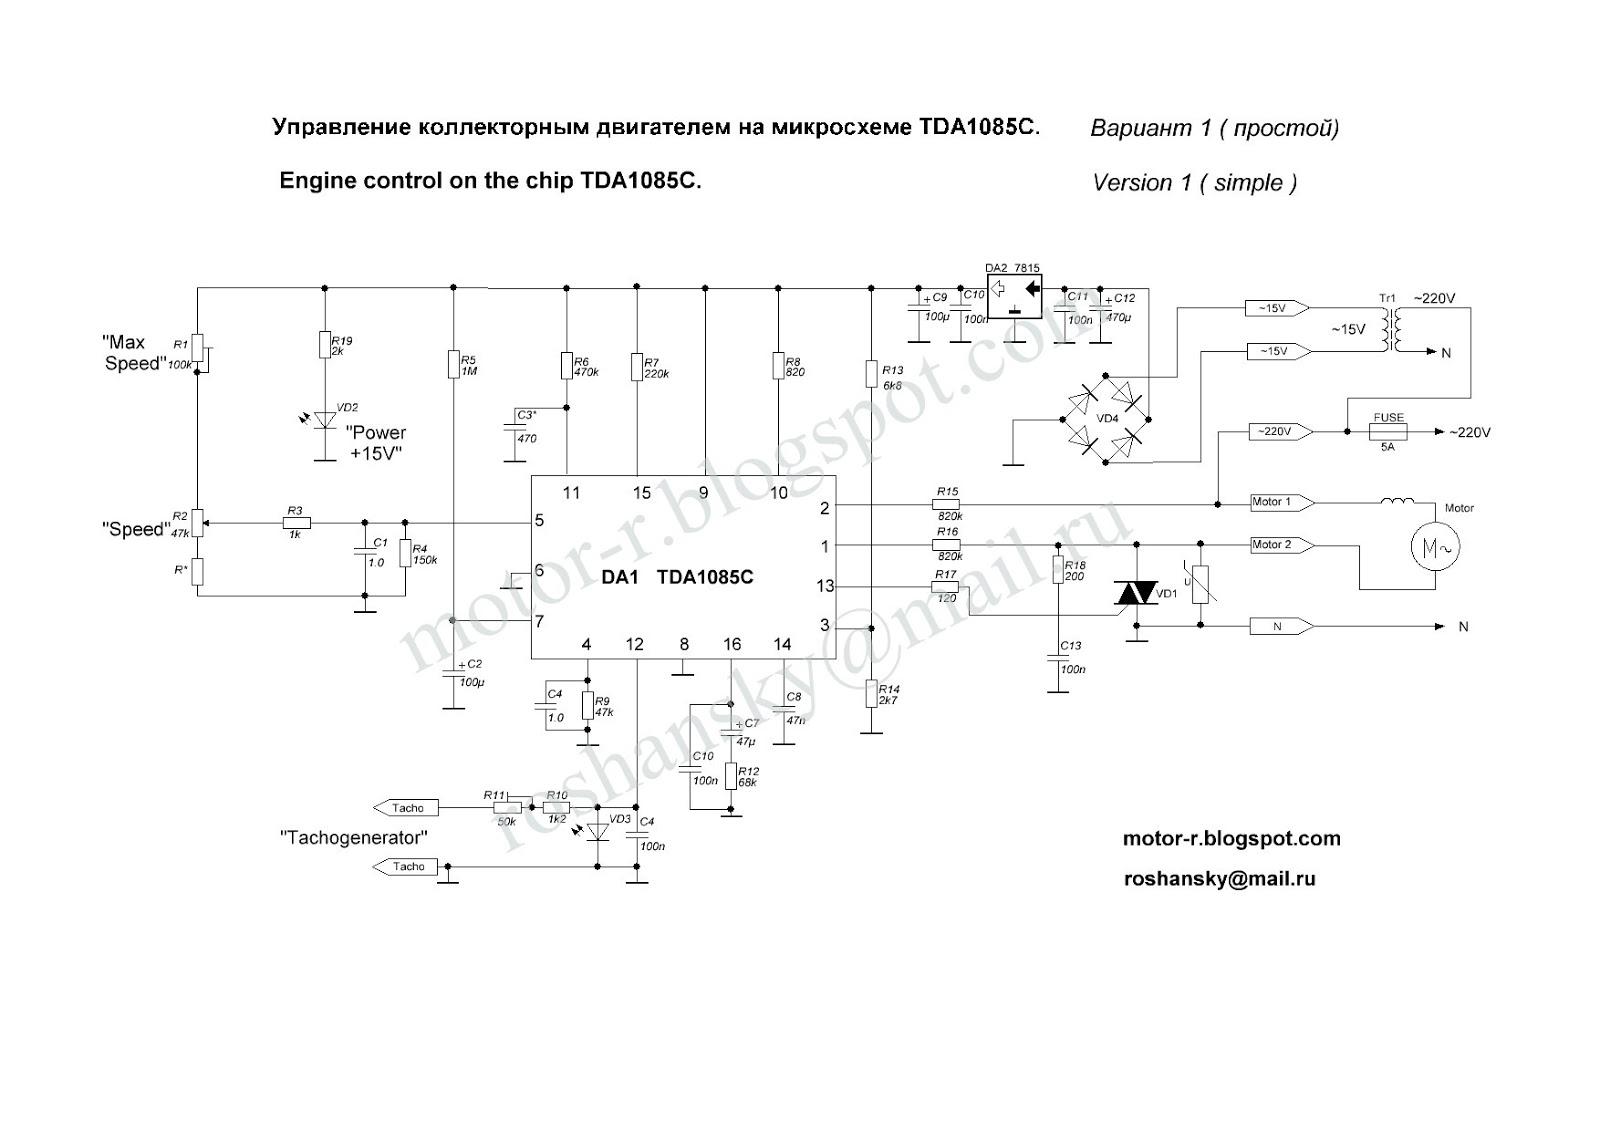 www.yandex.ru электронный трансформатор схема